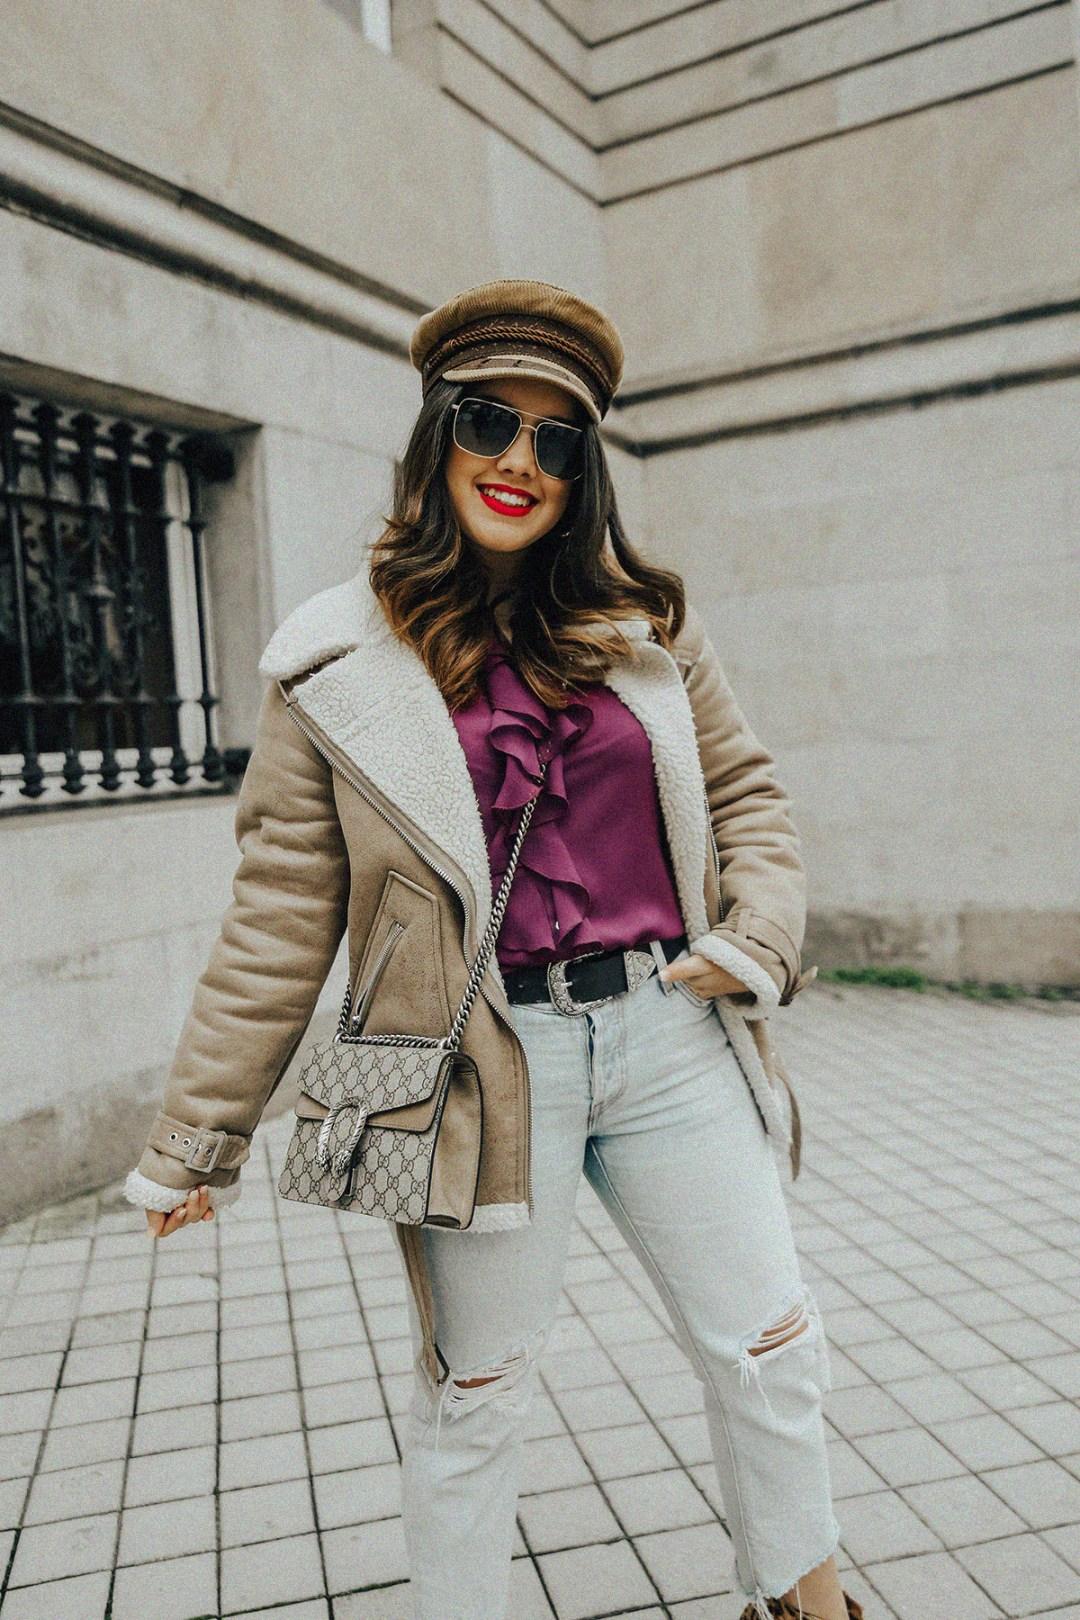 chaqueta-borreguillo-blusa-volantes-pipa-de-la-paz-myblueberrynightsblog